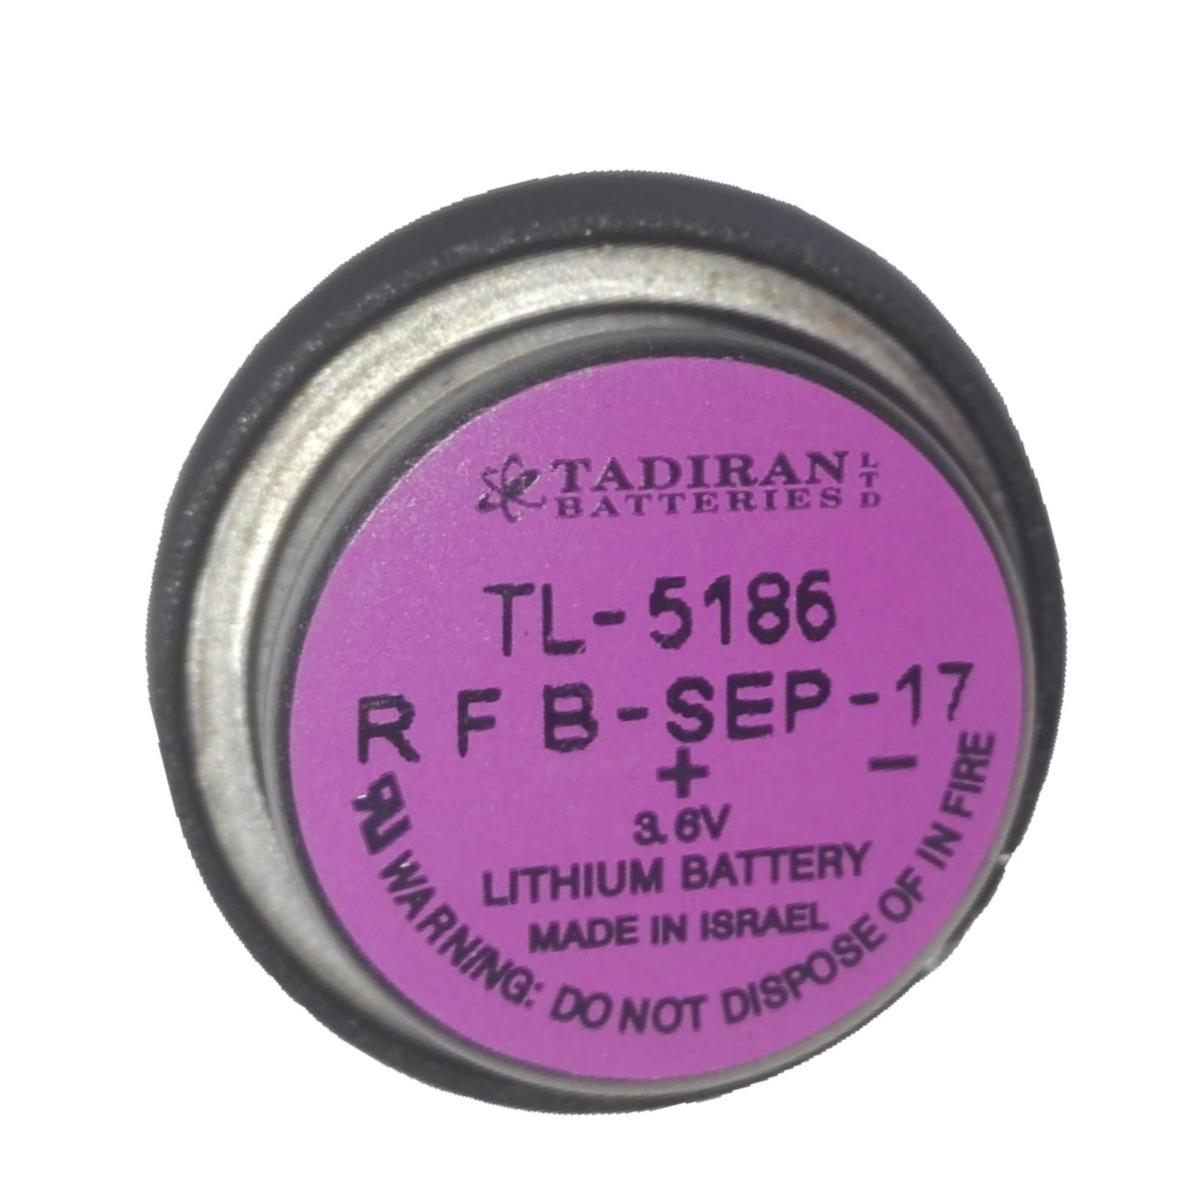 Pin nuôi nguồn Tadiran TL-5186 Lithium 3.6V 400mAh chính hãng Made in Israel